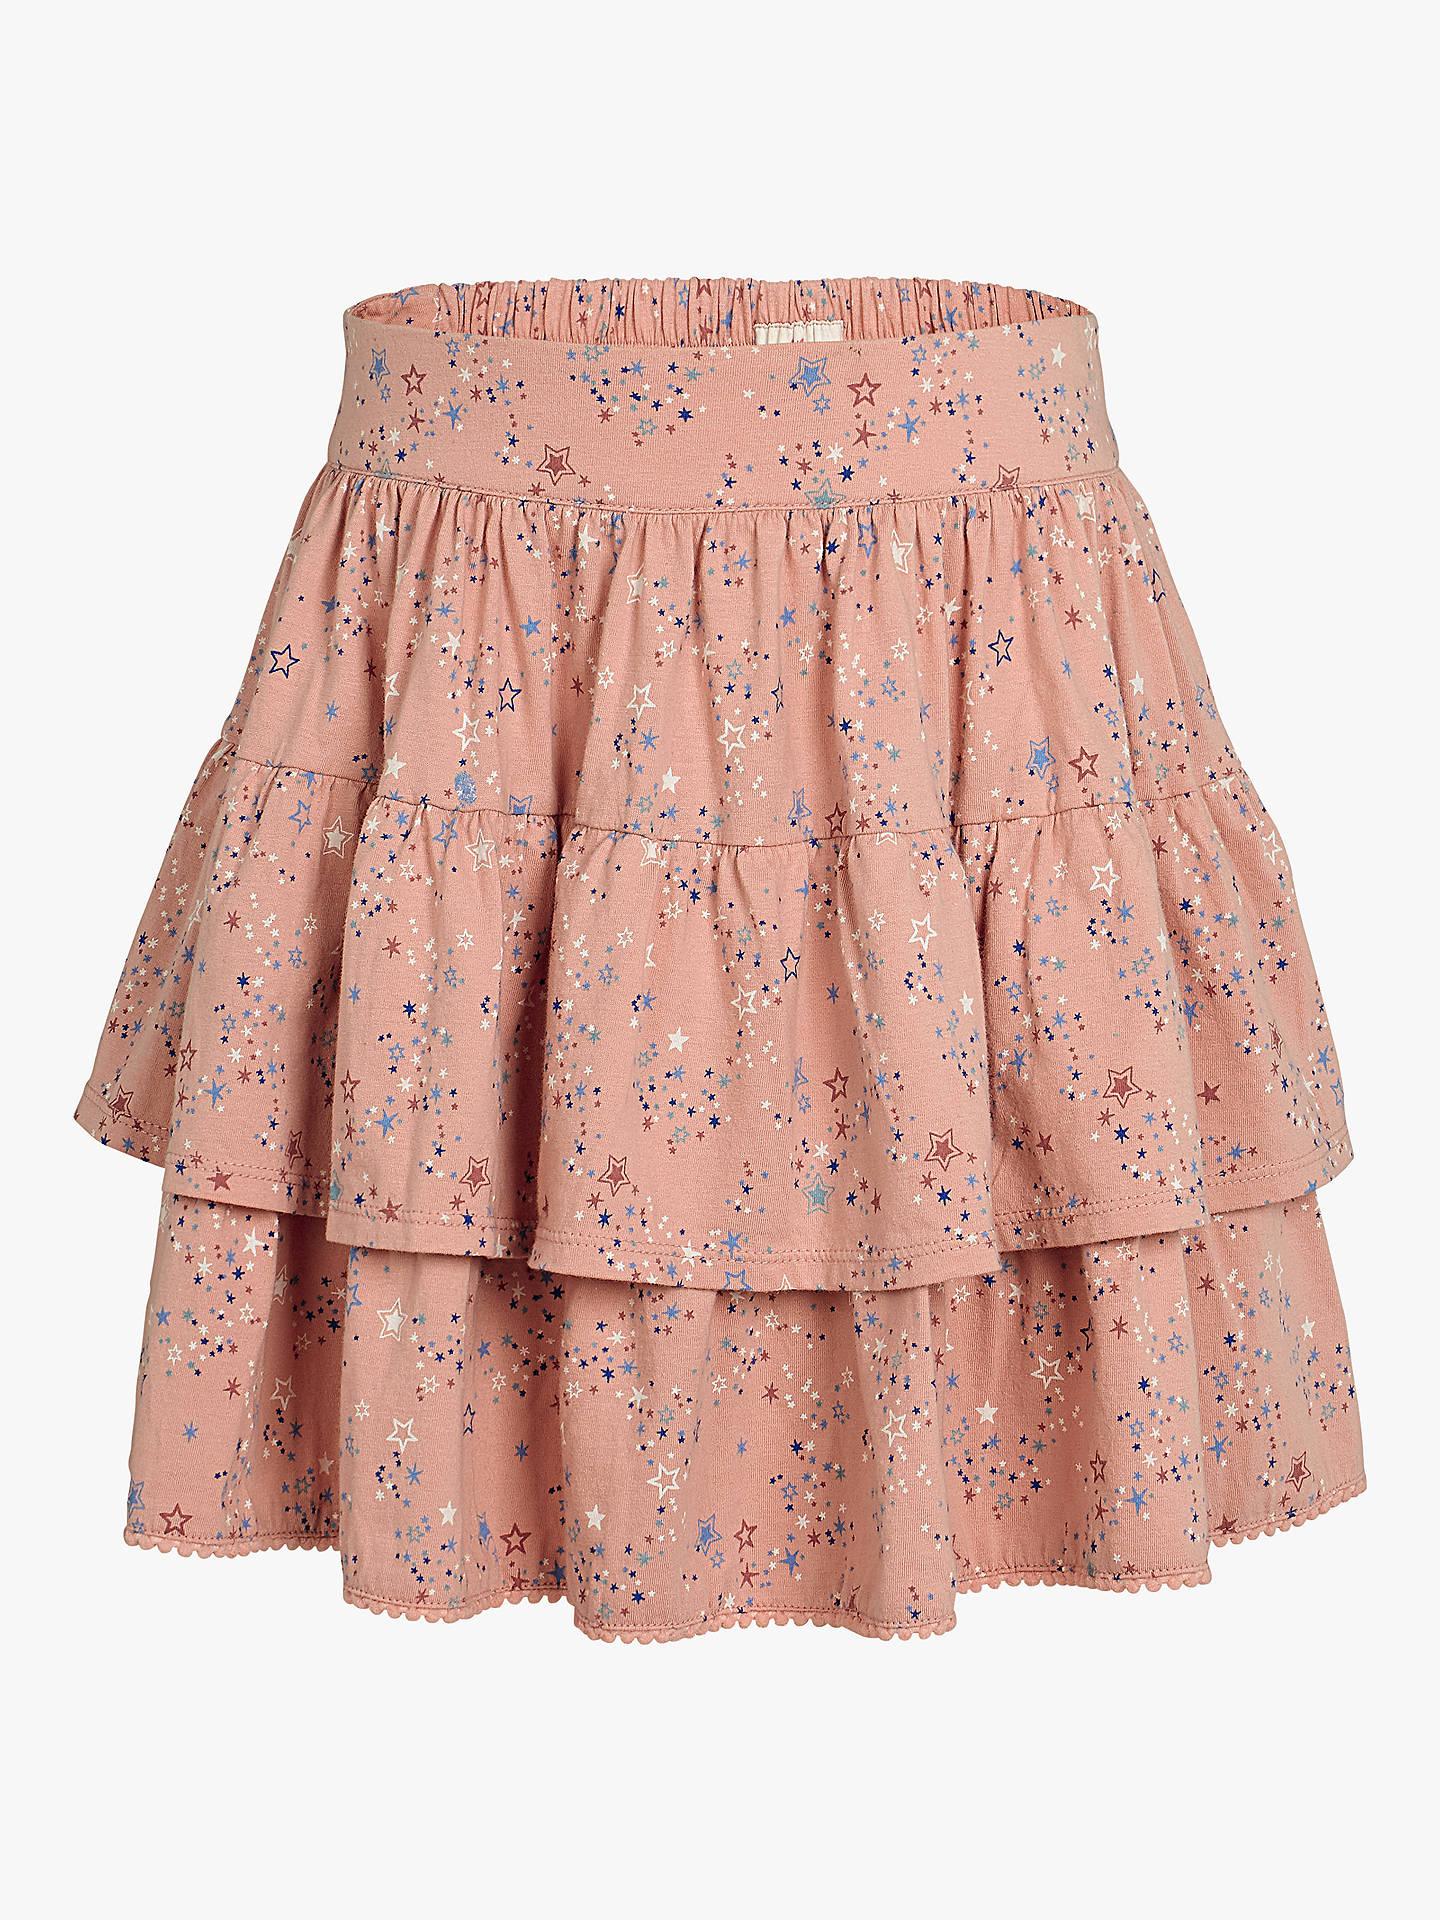 ea7f92c23b Buy Fat Face Girls' Star Skirt, Dusky Pink, 2-3 years Online ...